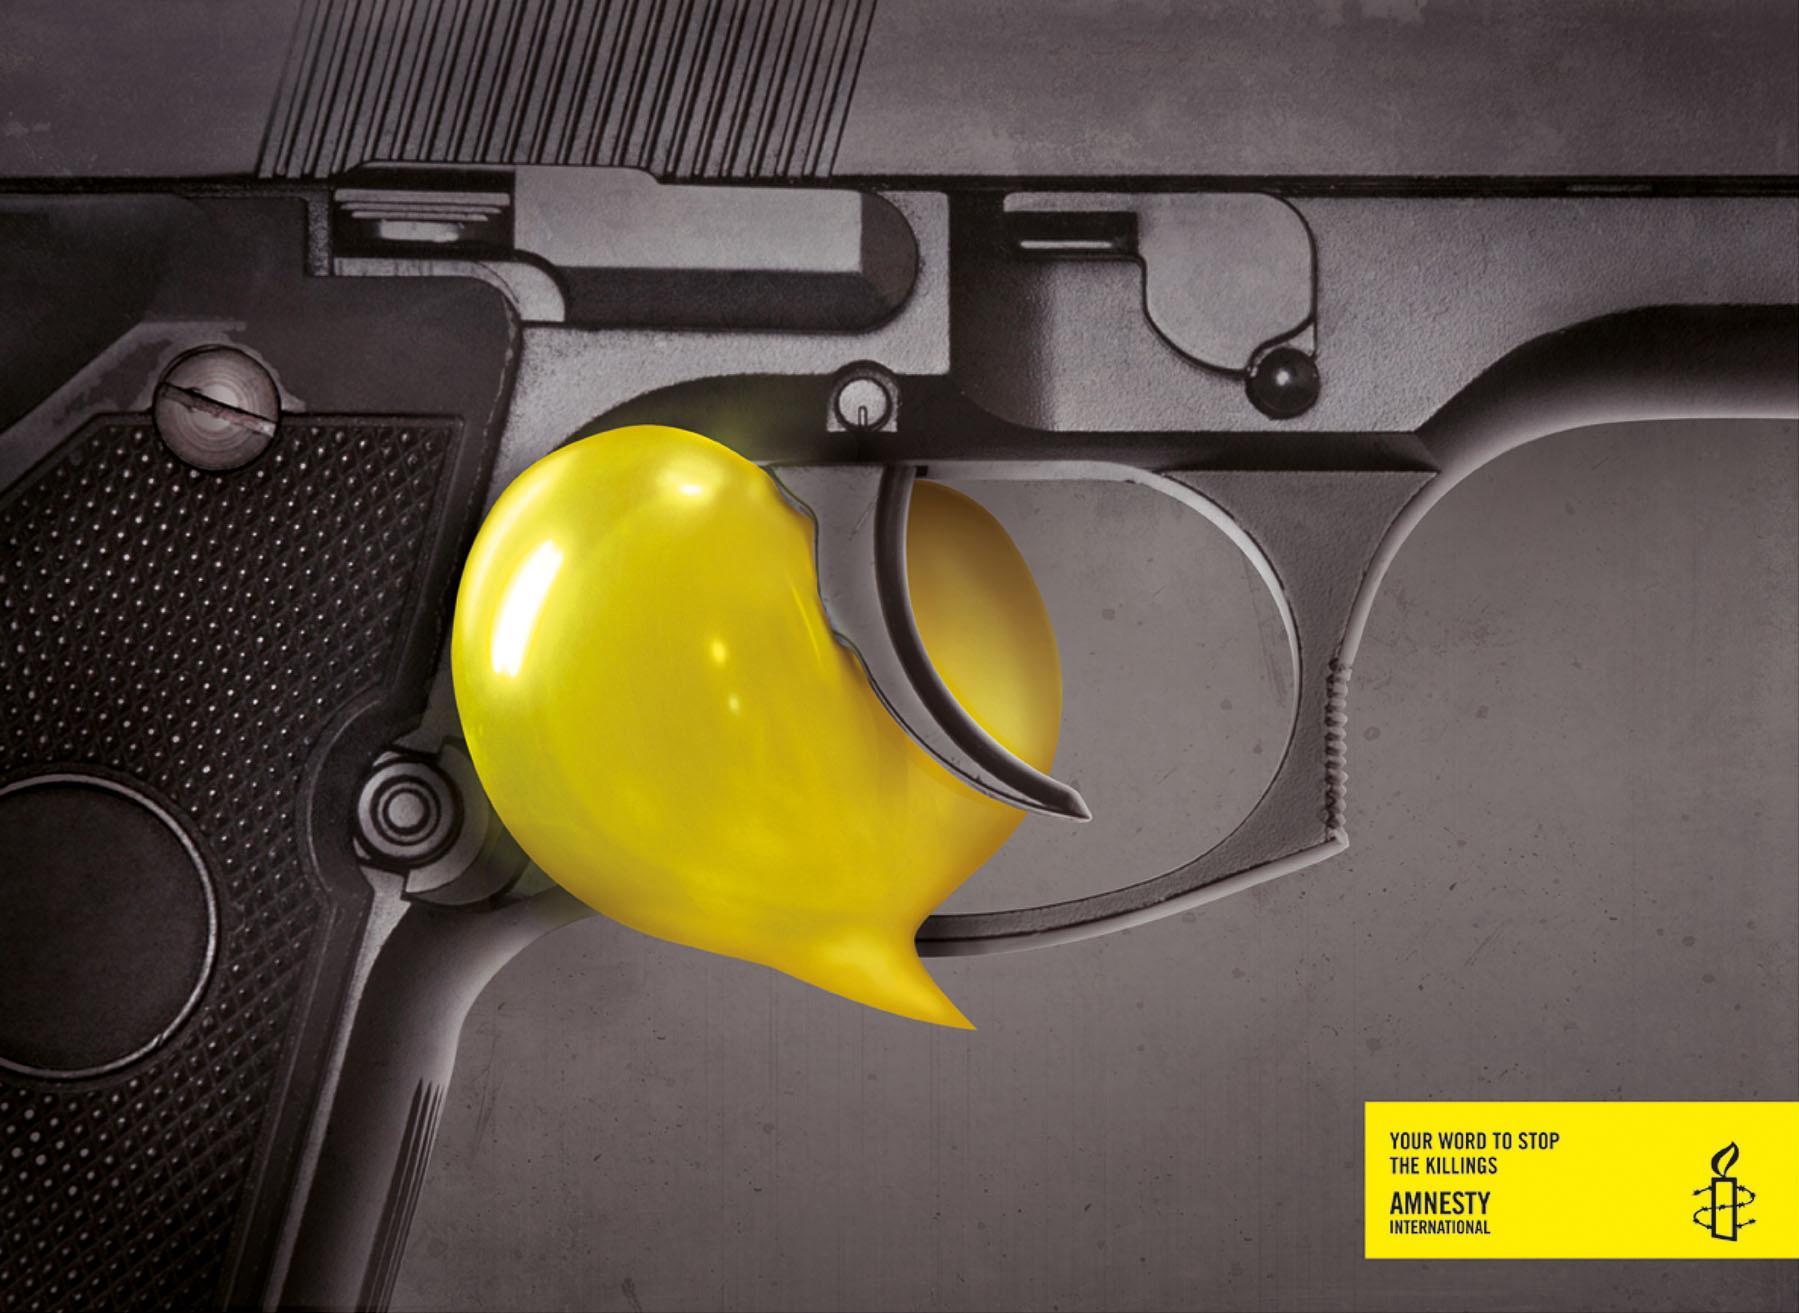 Amnesty International Print Ad -  Your word, Gun